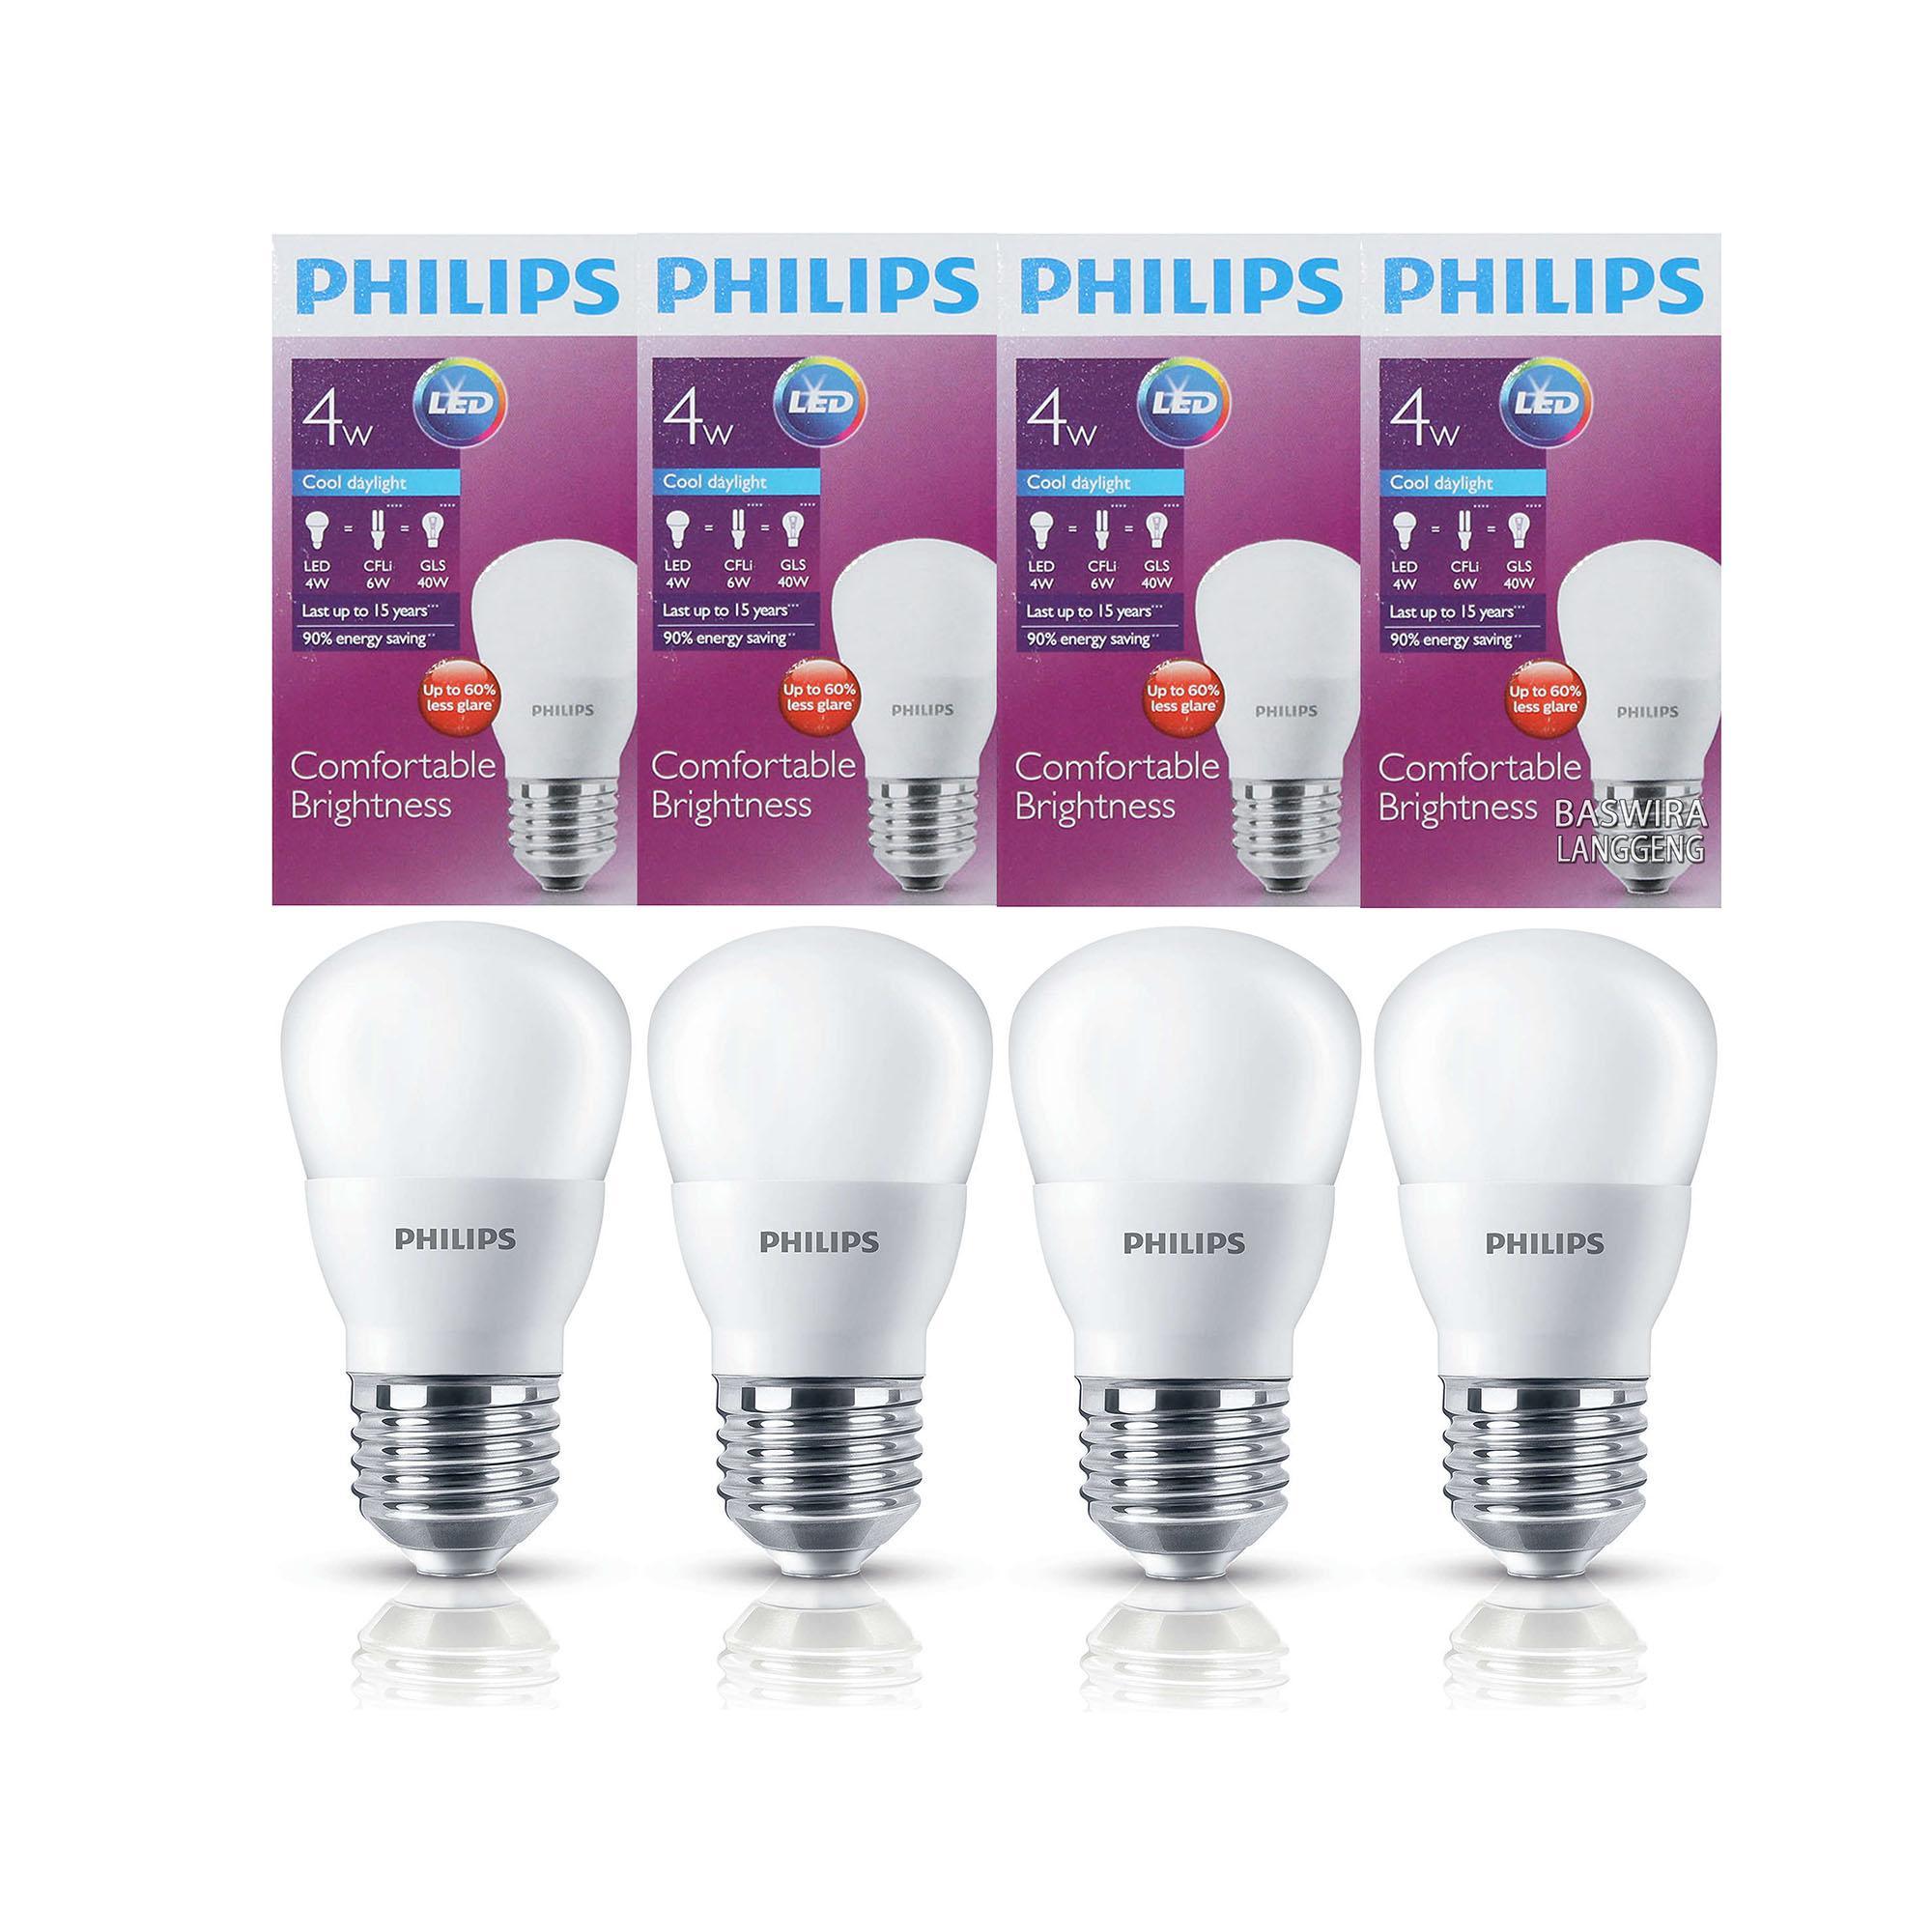 PHILIPS Lampu Led Bulb 4 Watt 4 W 4Wat 4W Putih Paket 4 .